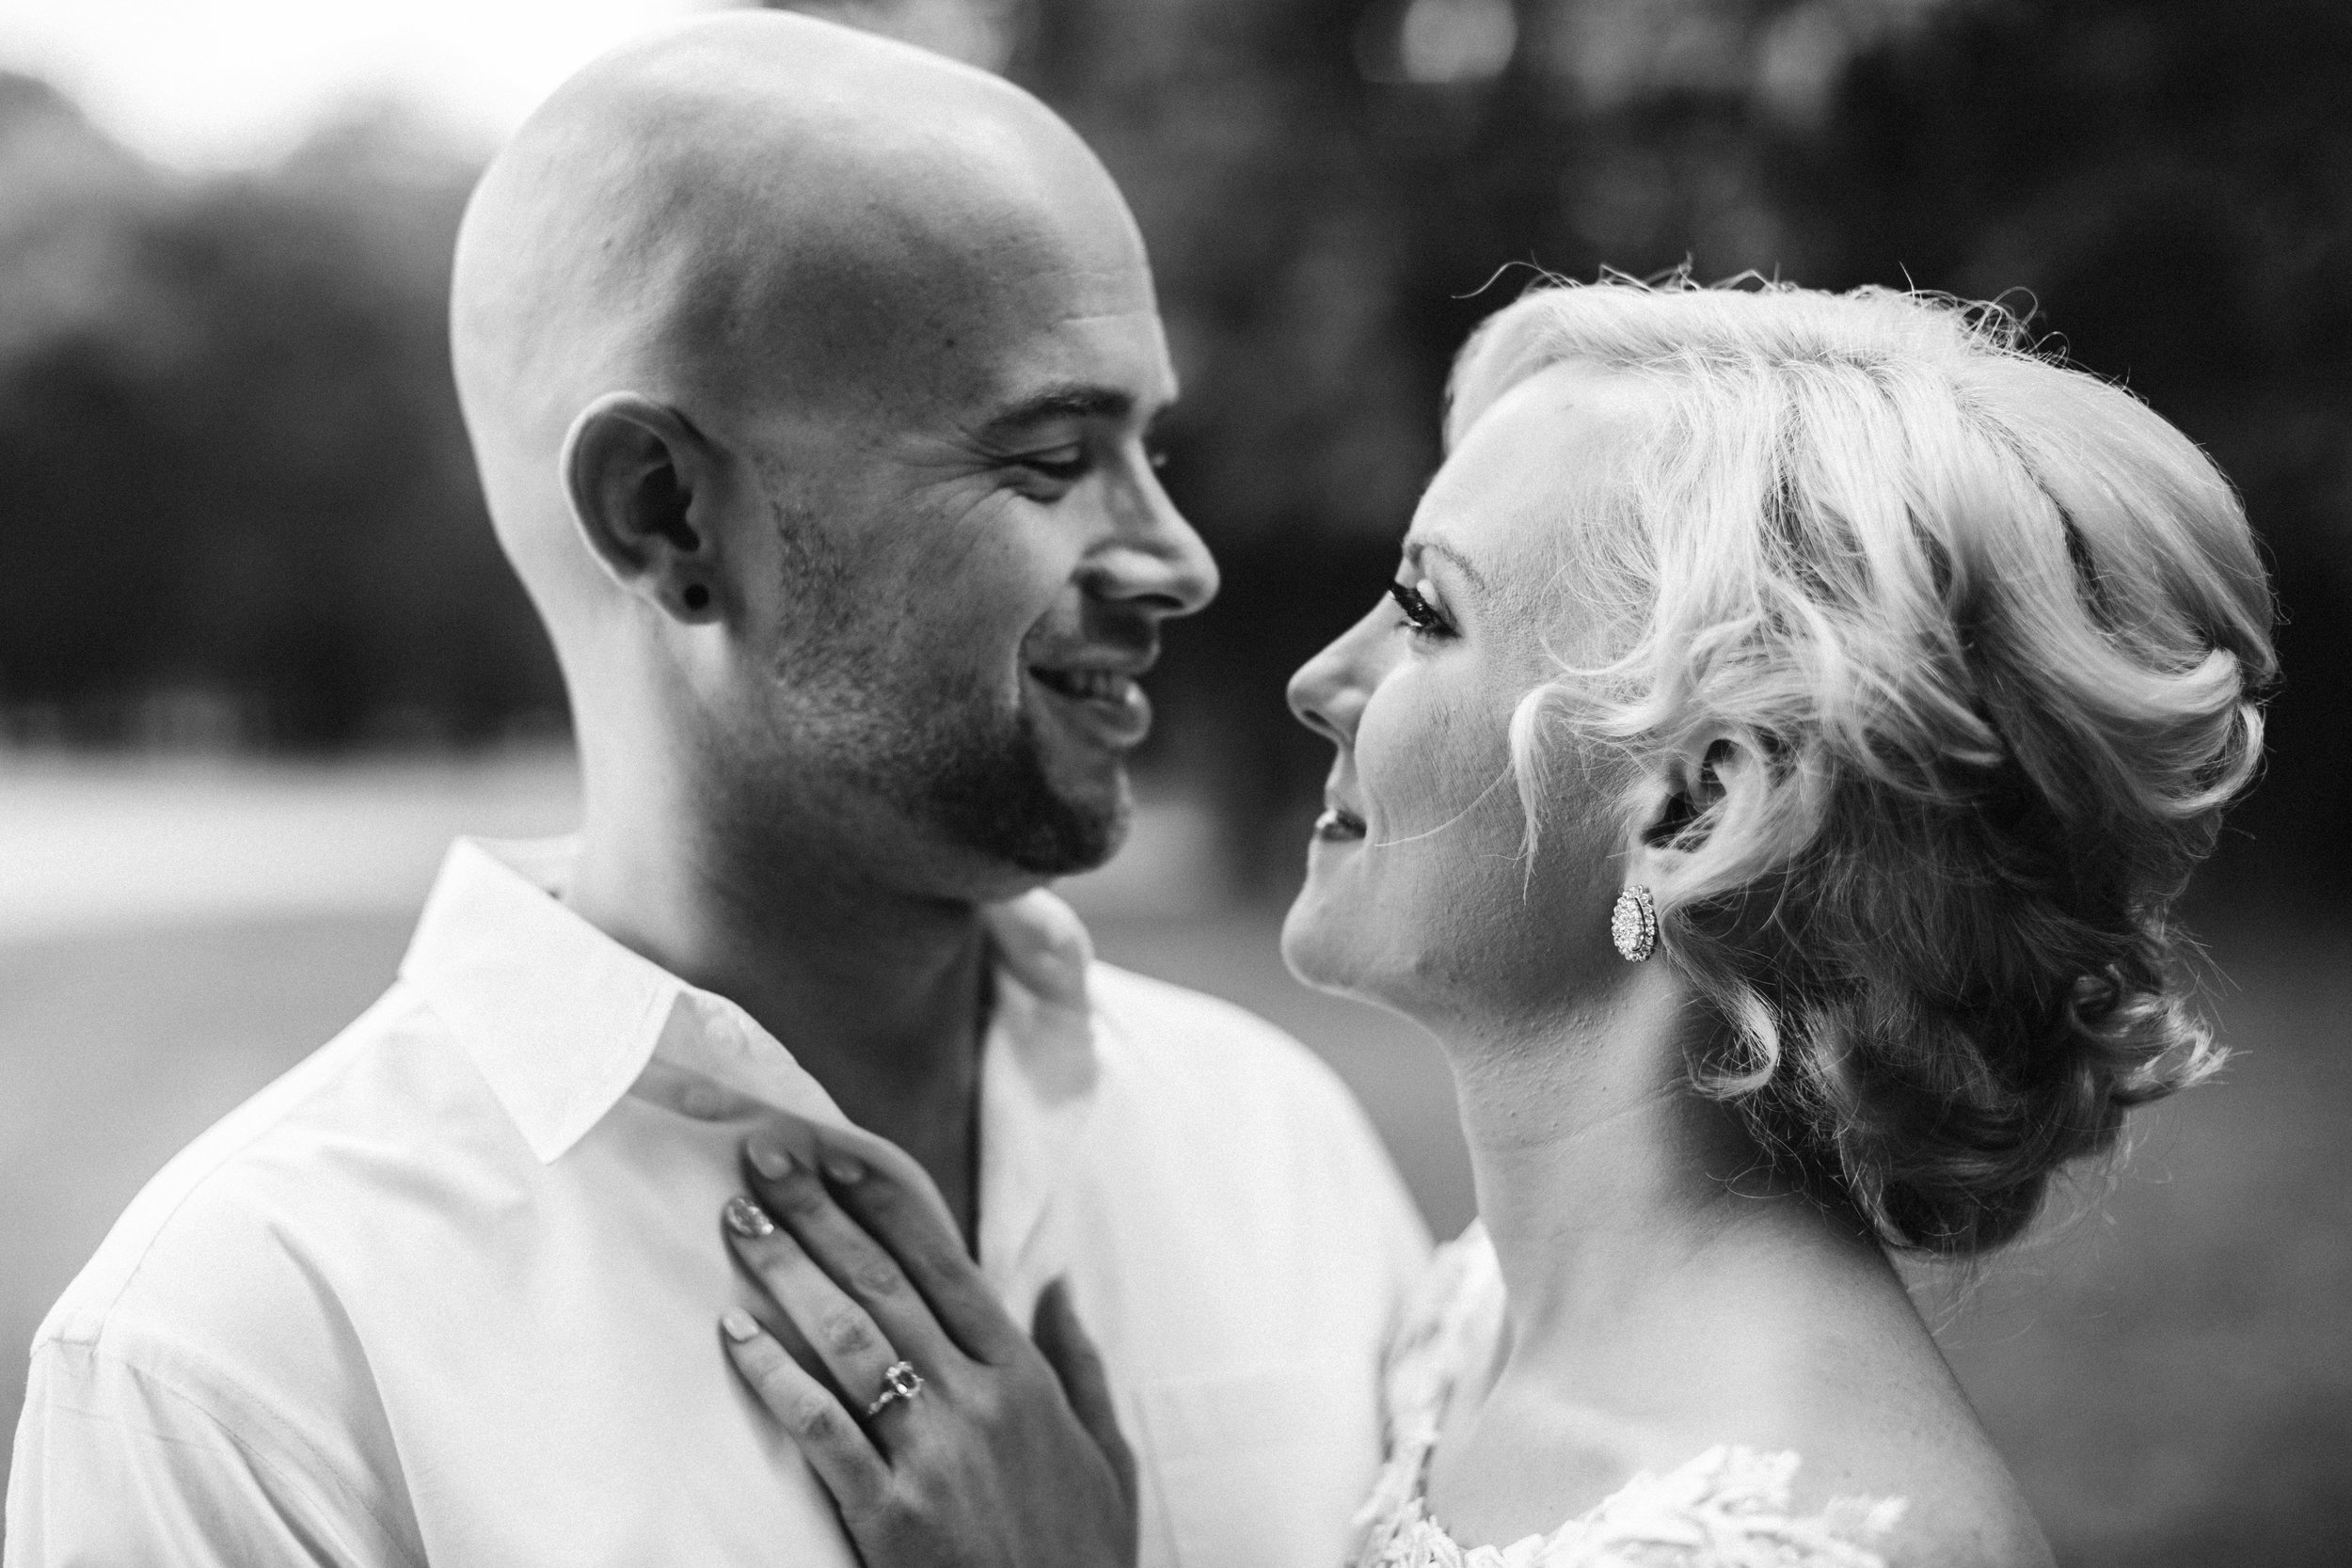 2018.09.02 Ray and Sarah Prizner Nashville TN Wedding FINALS-113.jpg